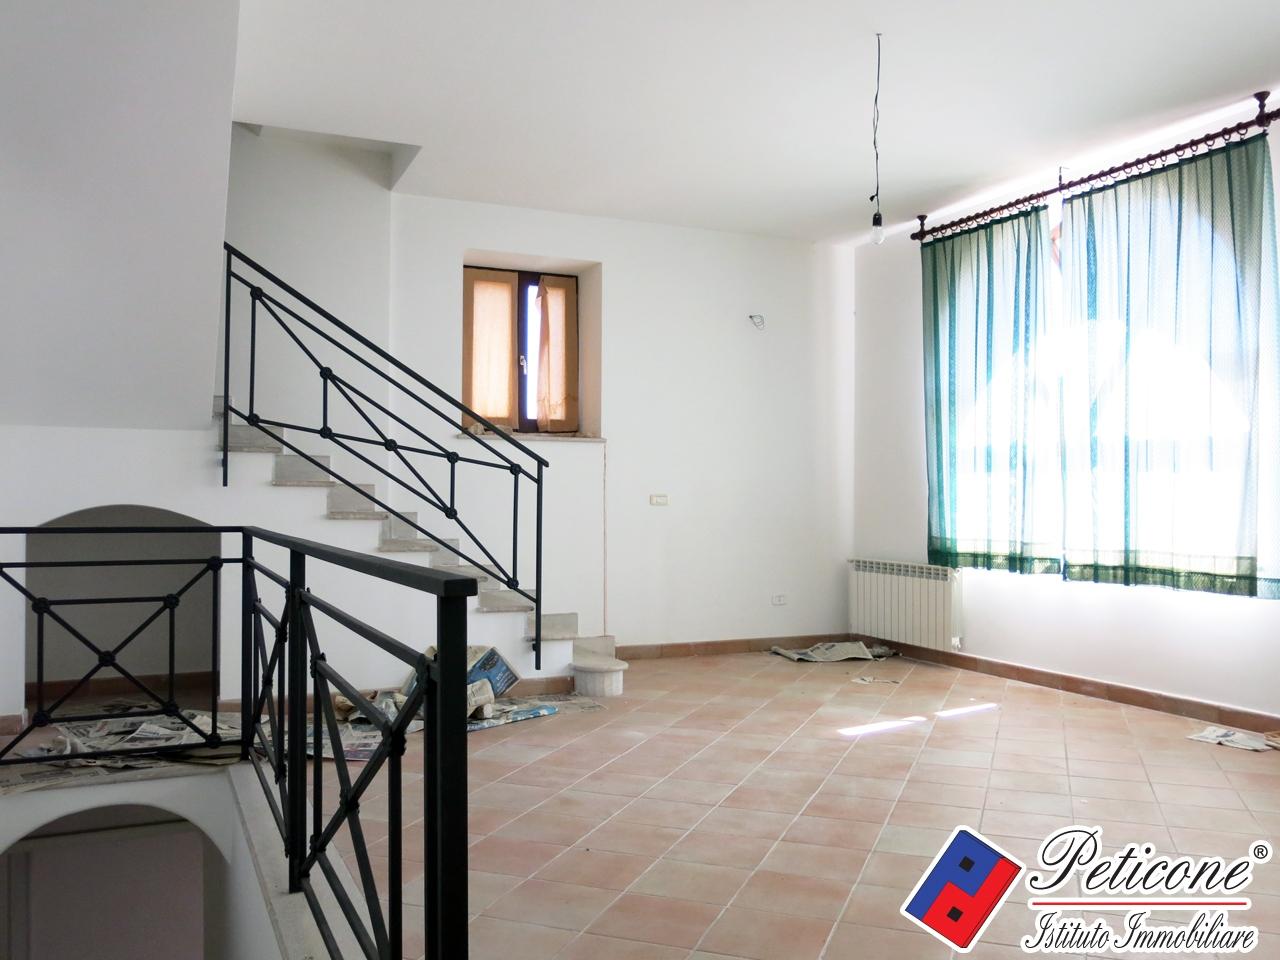 Villa in Vendita a Gaeta: 5 locali, 250 mq - Foto 9